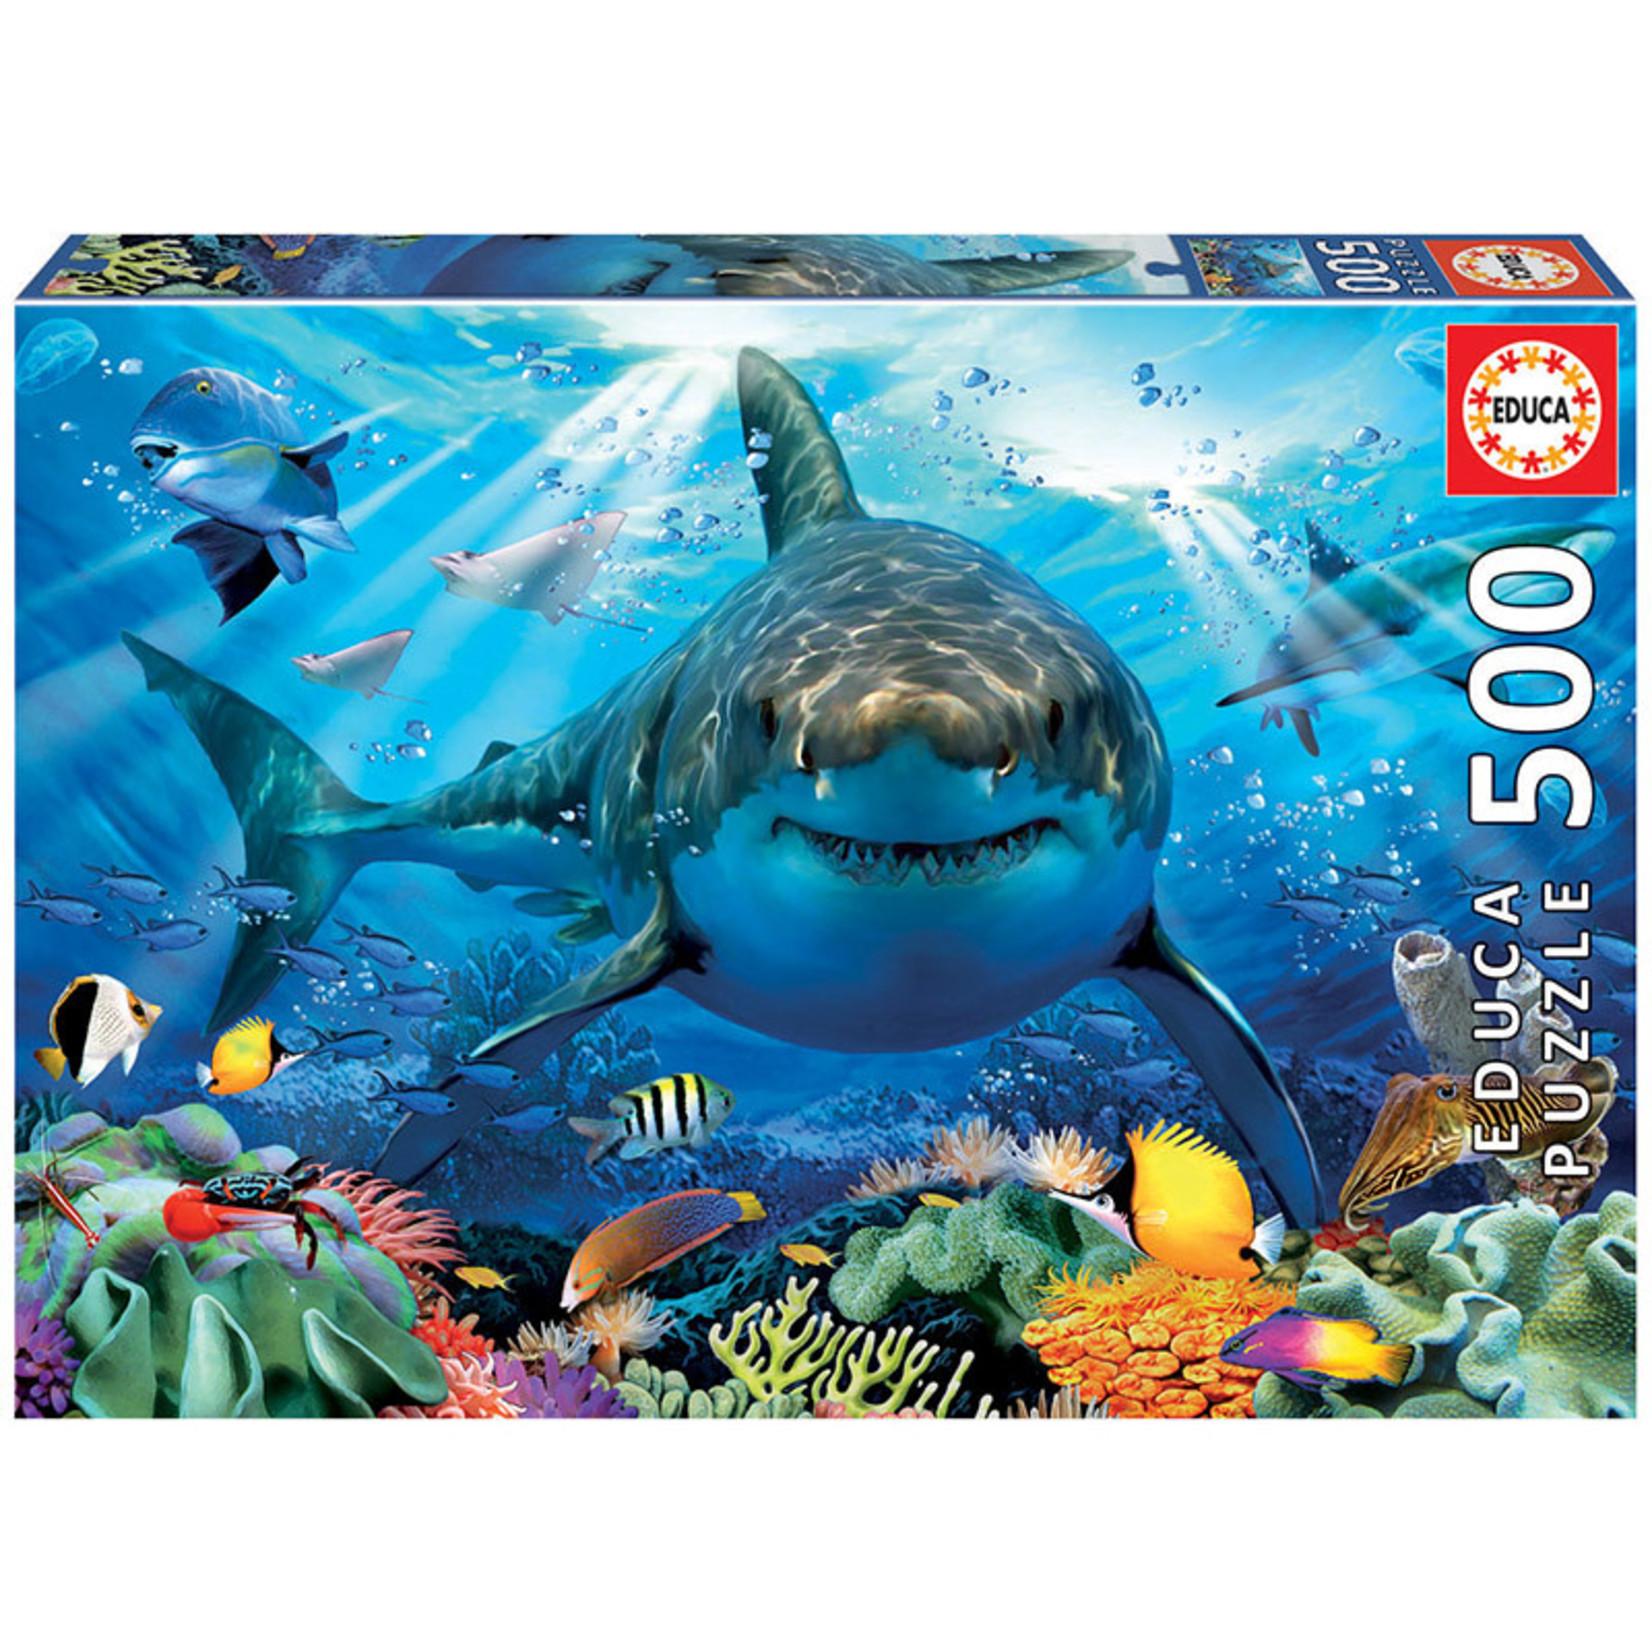 Educa Puzzles Great White Shark 500pc